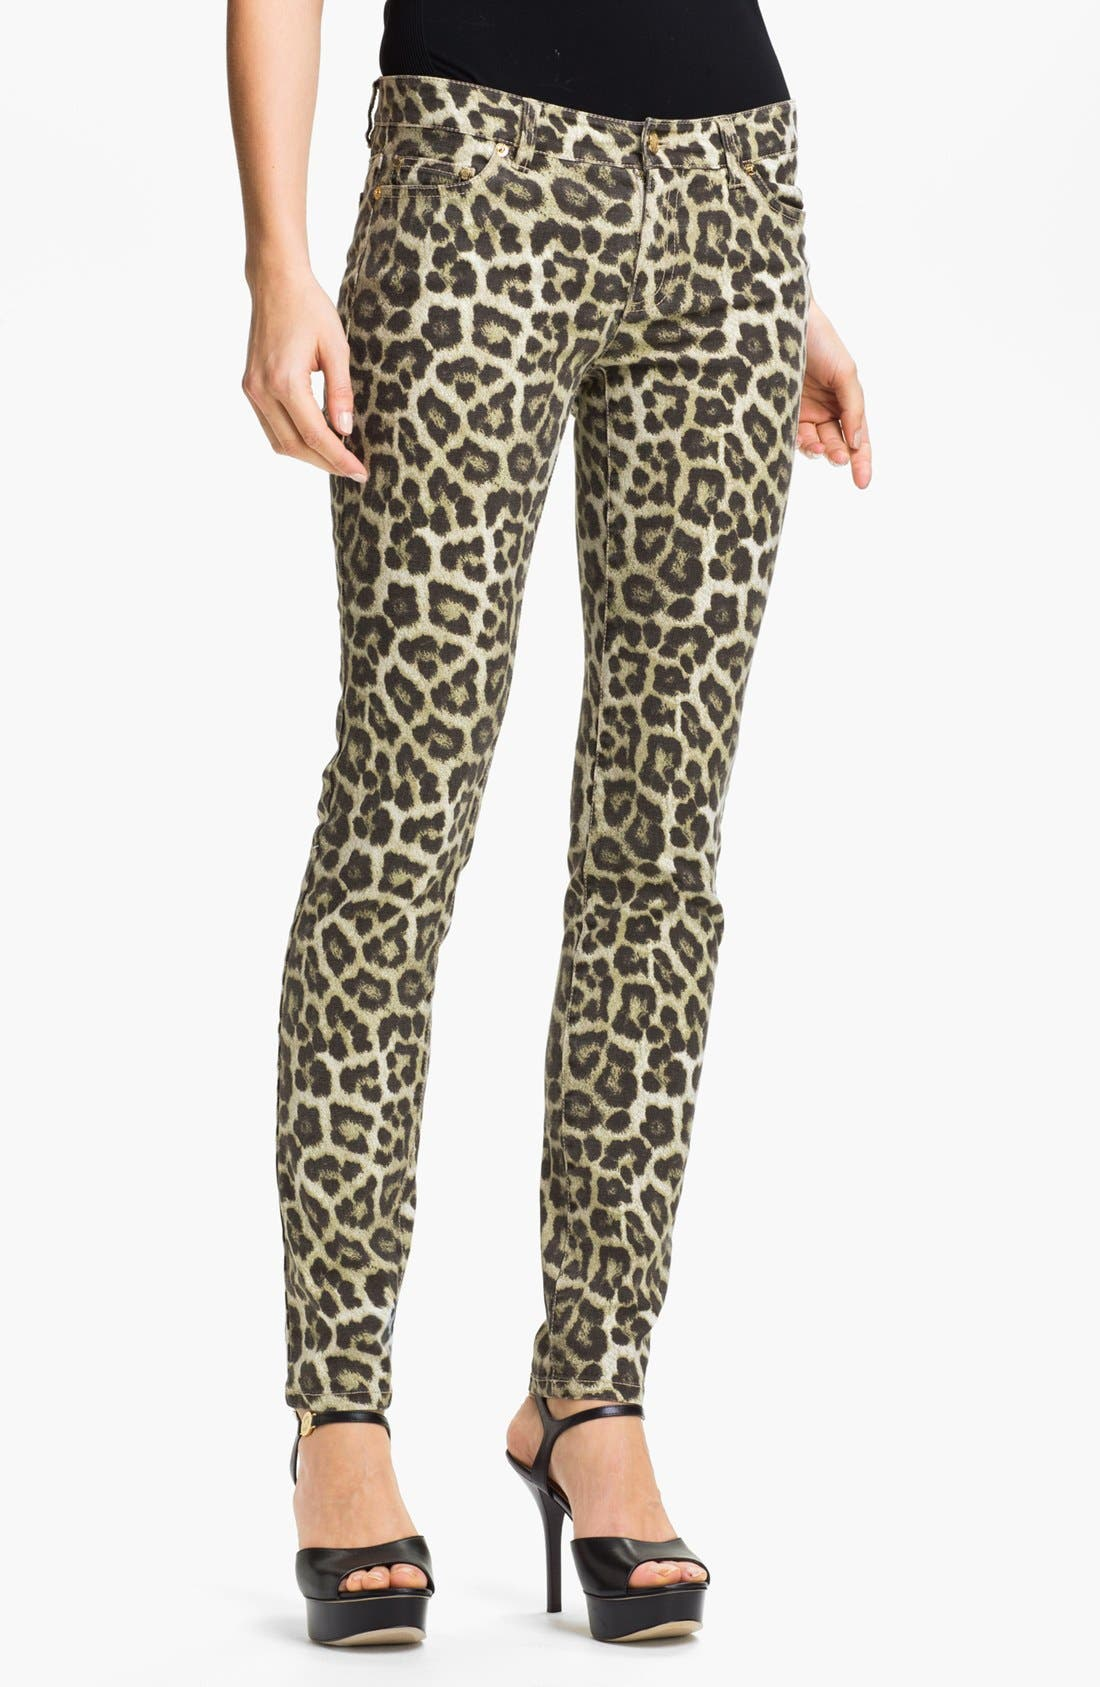 Alternate Image 1 Selected - MICHAEL Michael Kors 'Savannah' Leopard Print Skinny Jeans (Petite)